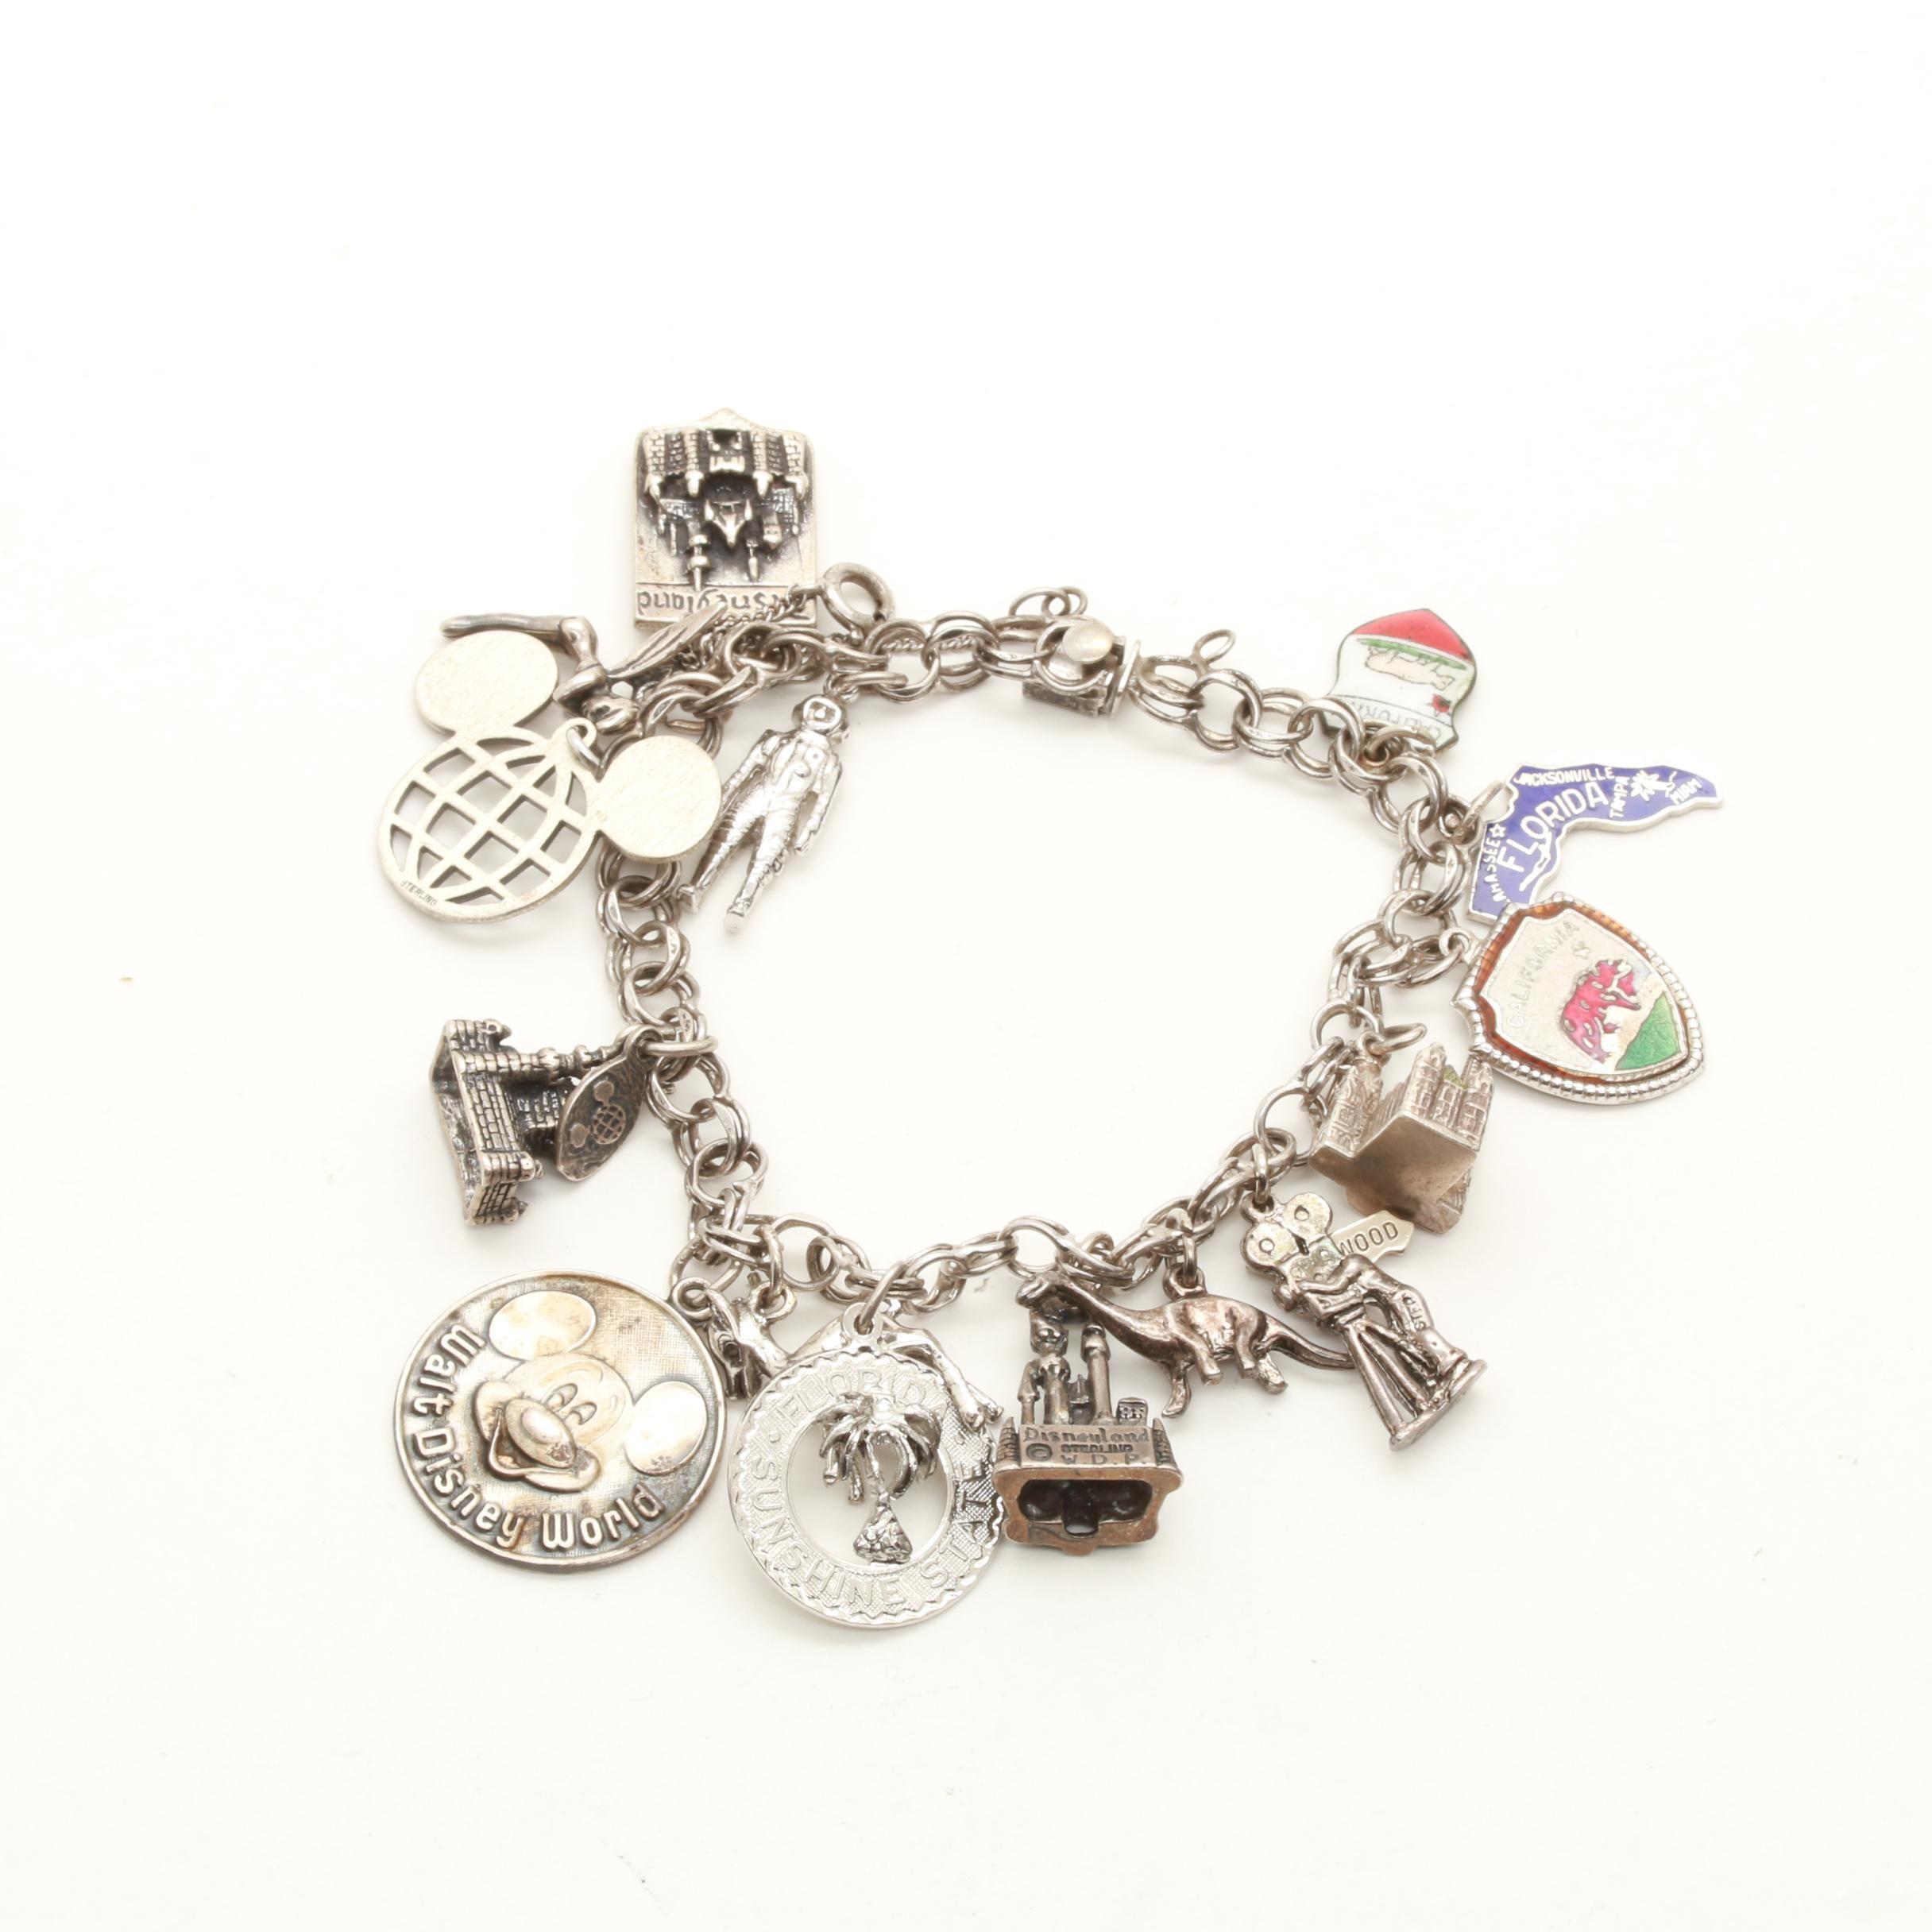 Sterling Silver Charm Bracelet Including Disney Charms Ebth